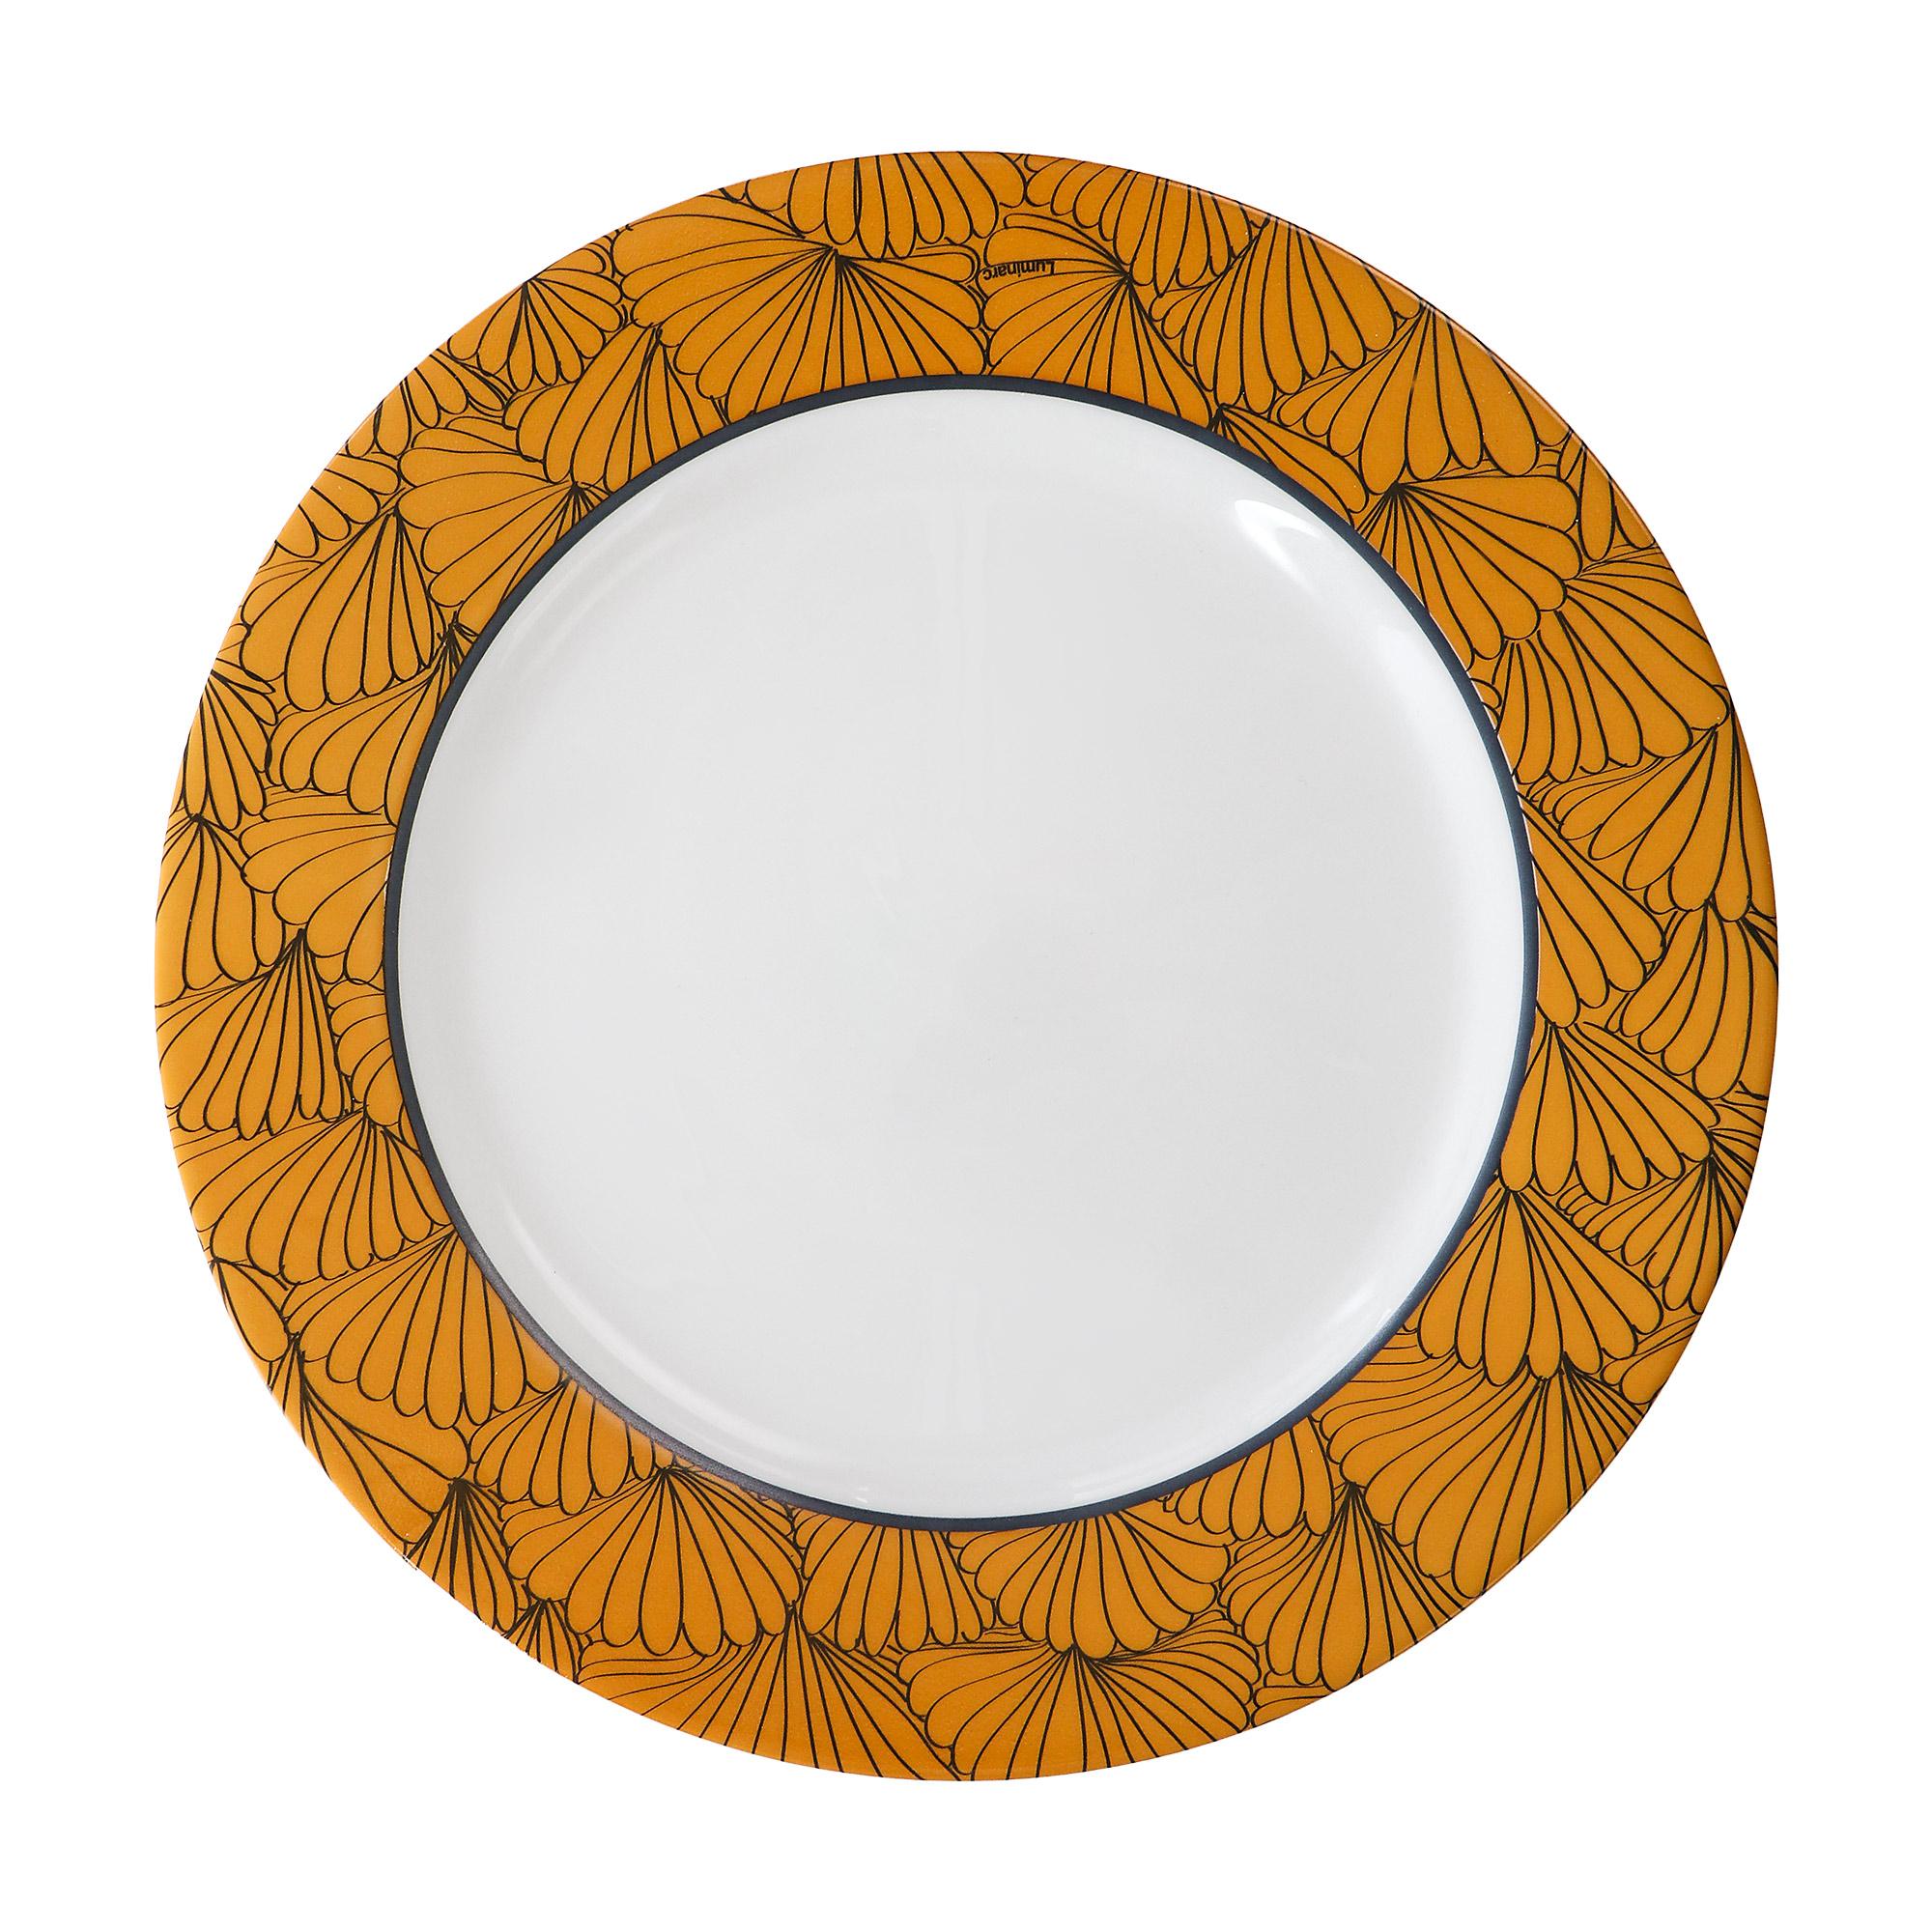 Фото - Тарелка обеденная Luminarc Prusse 26 см тарелка обеденная 26 см luminarc arty marine